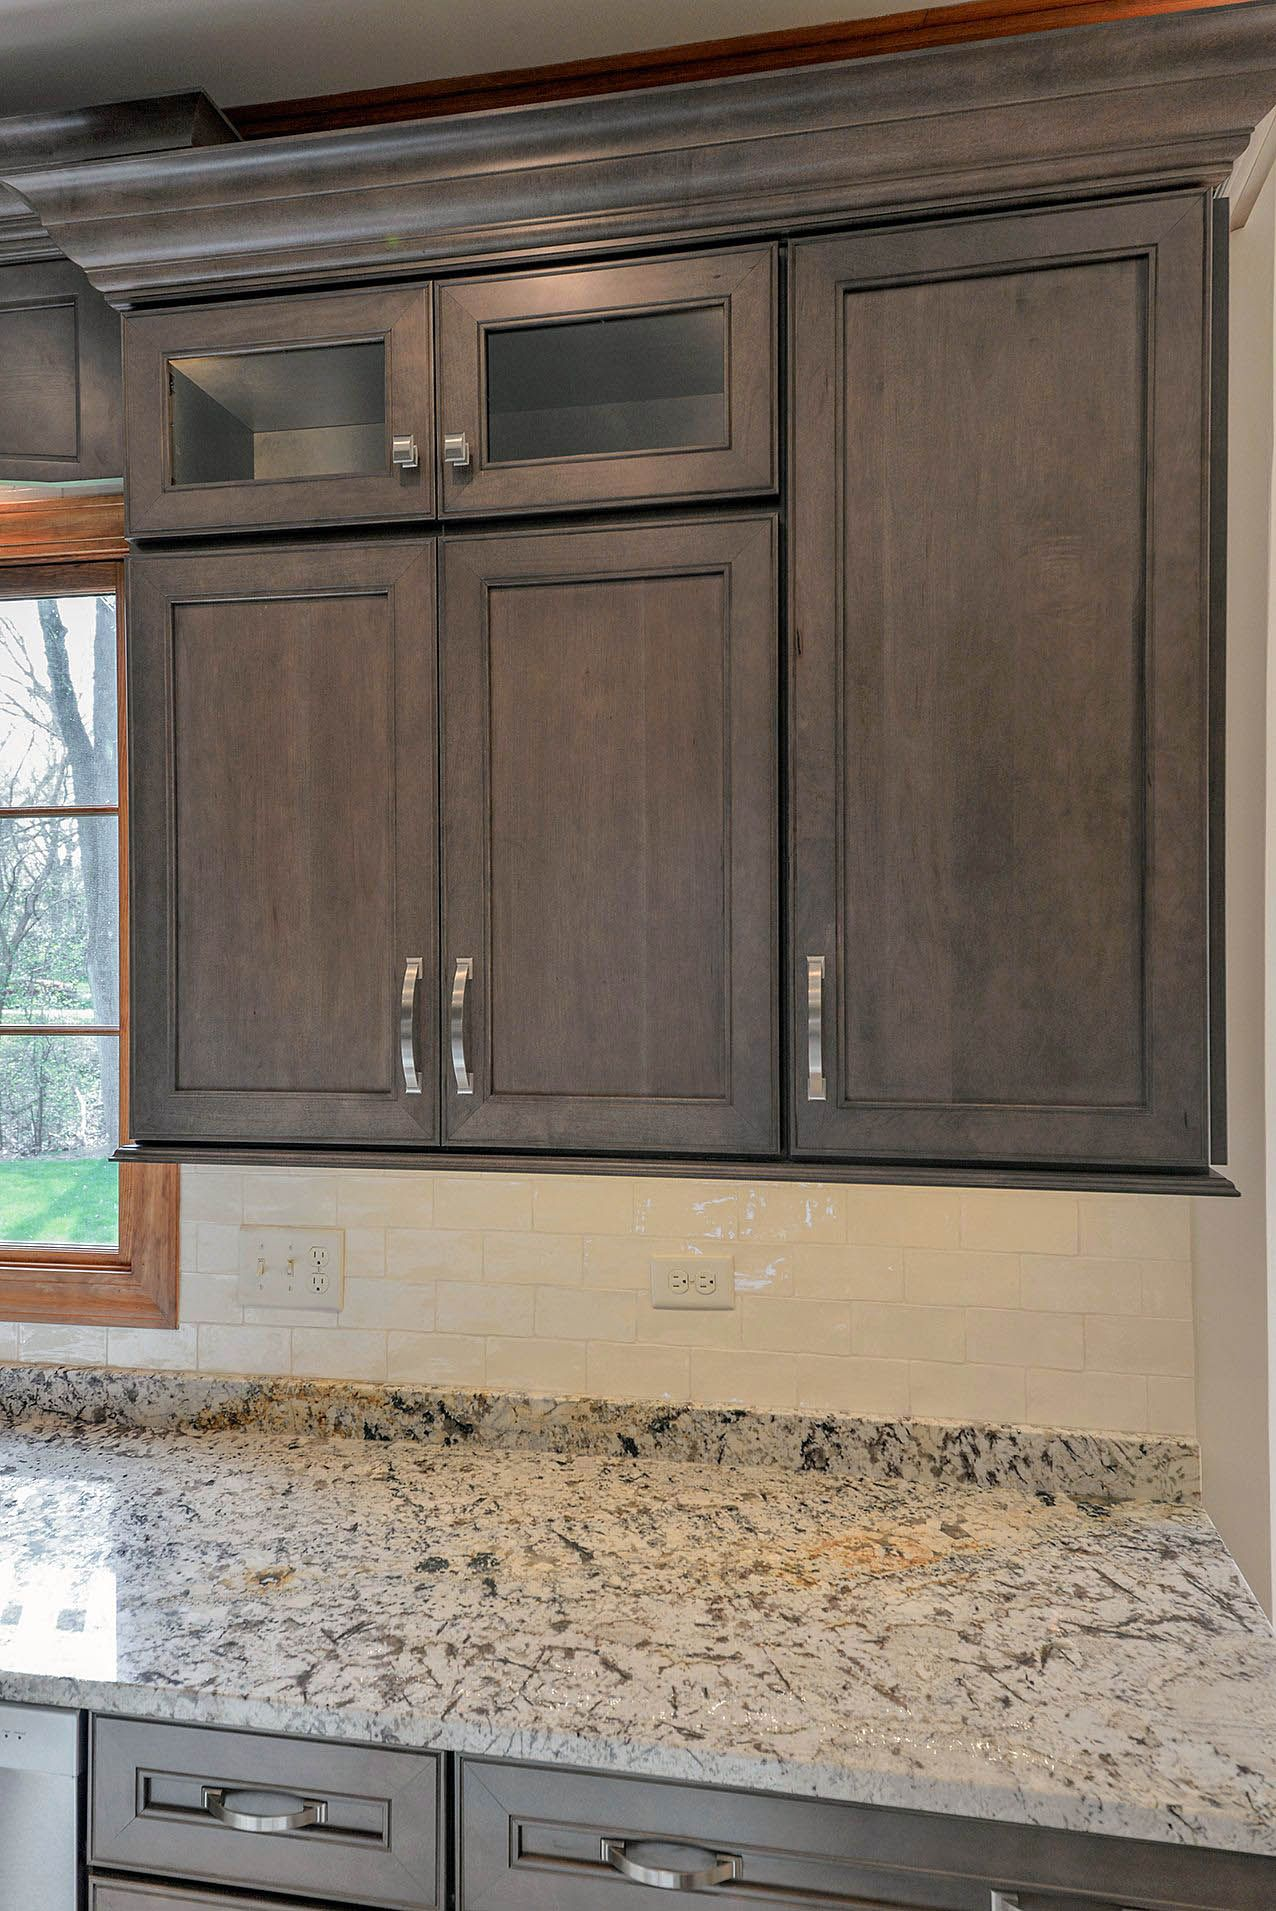 Kitchen Cupboard Door Concepts As Well As Layouts Stained Kitchen Cabinets Kitchen Cabinets And Backsplash Maple Kitchen Cabinets